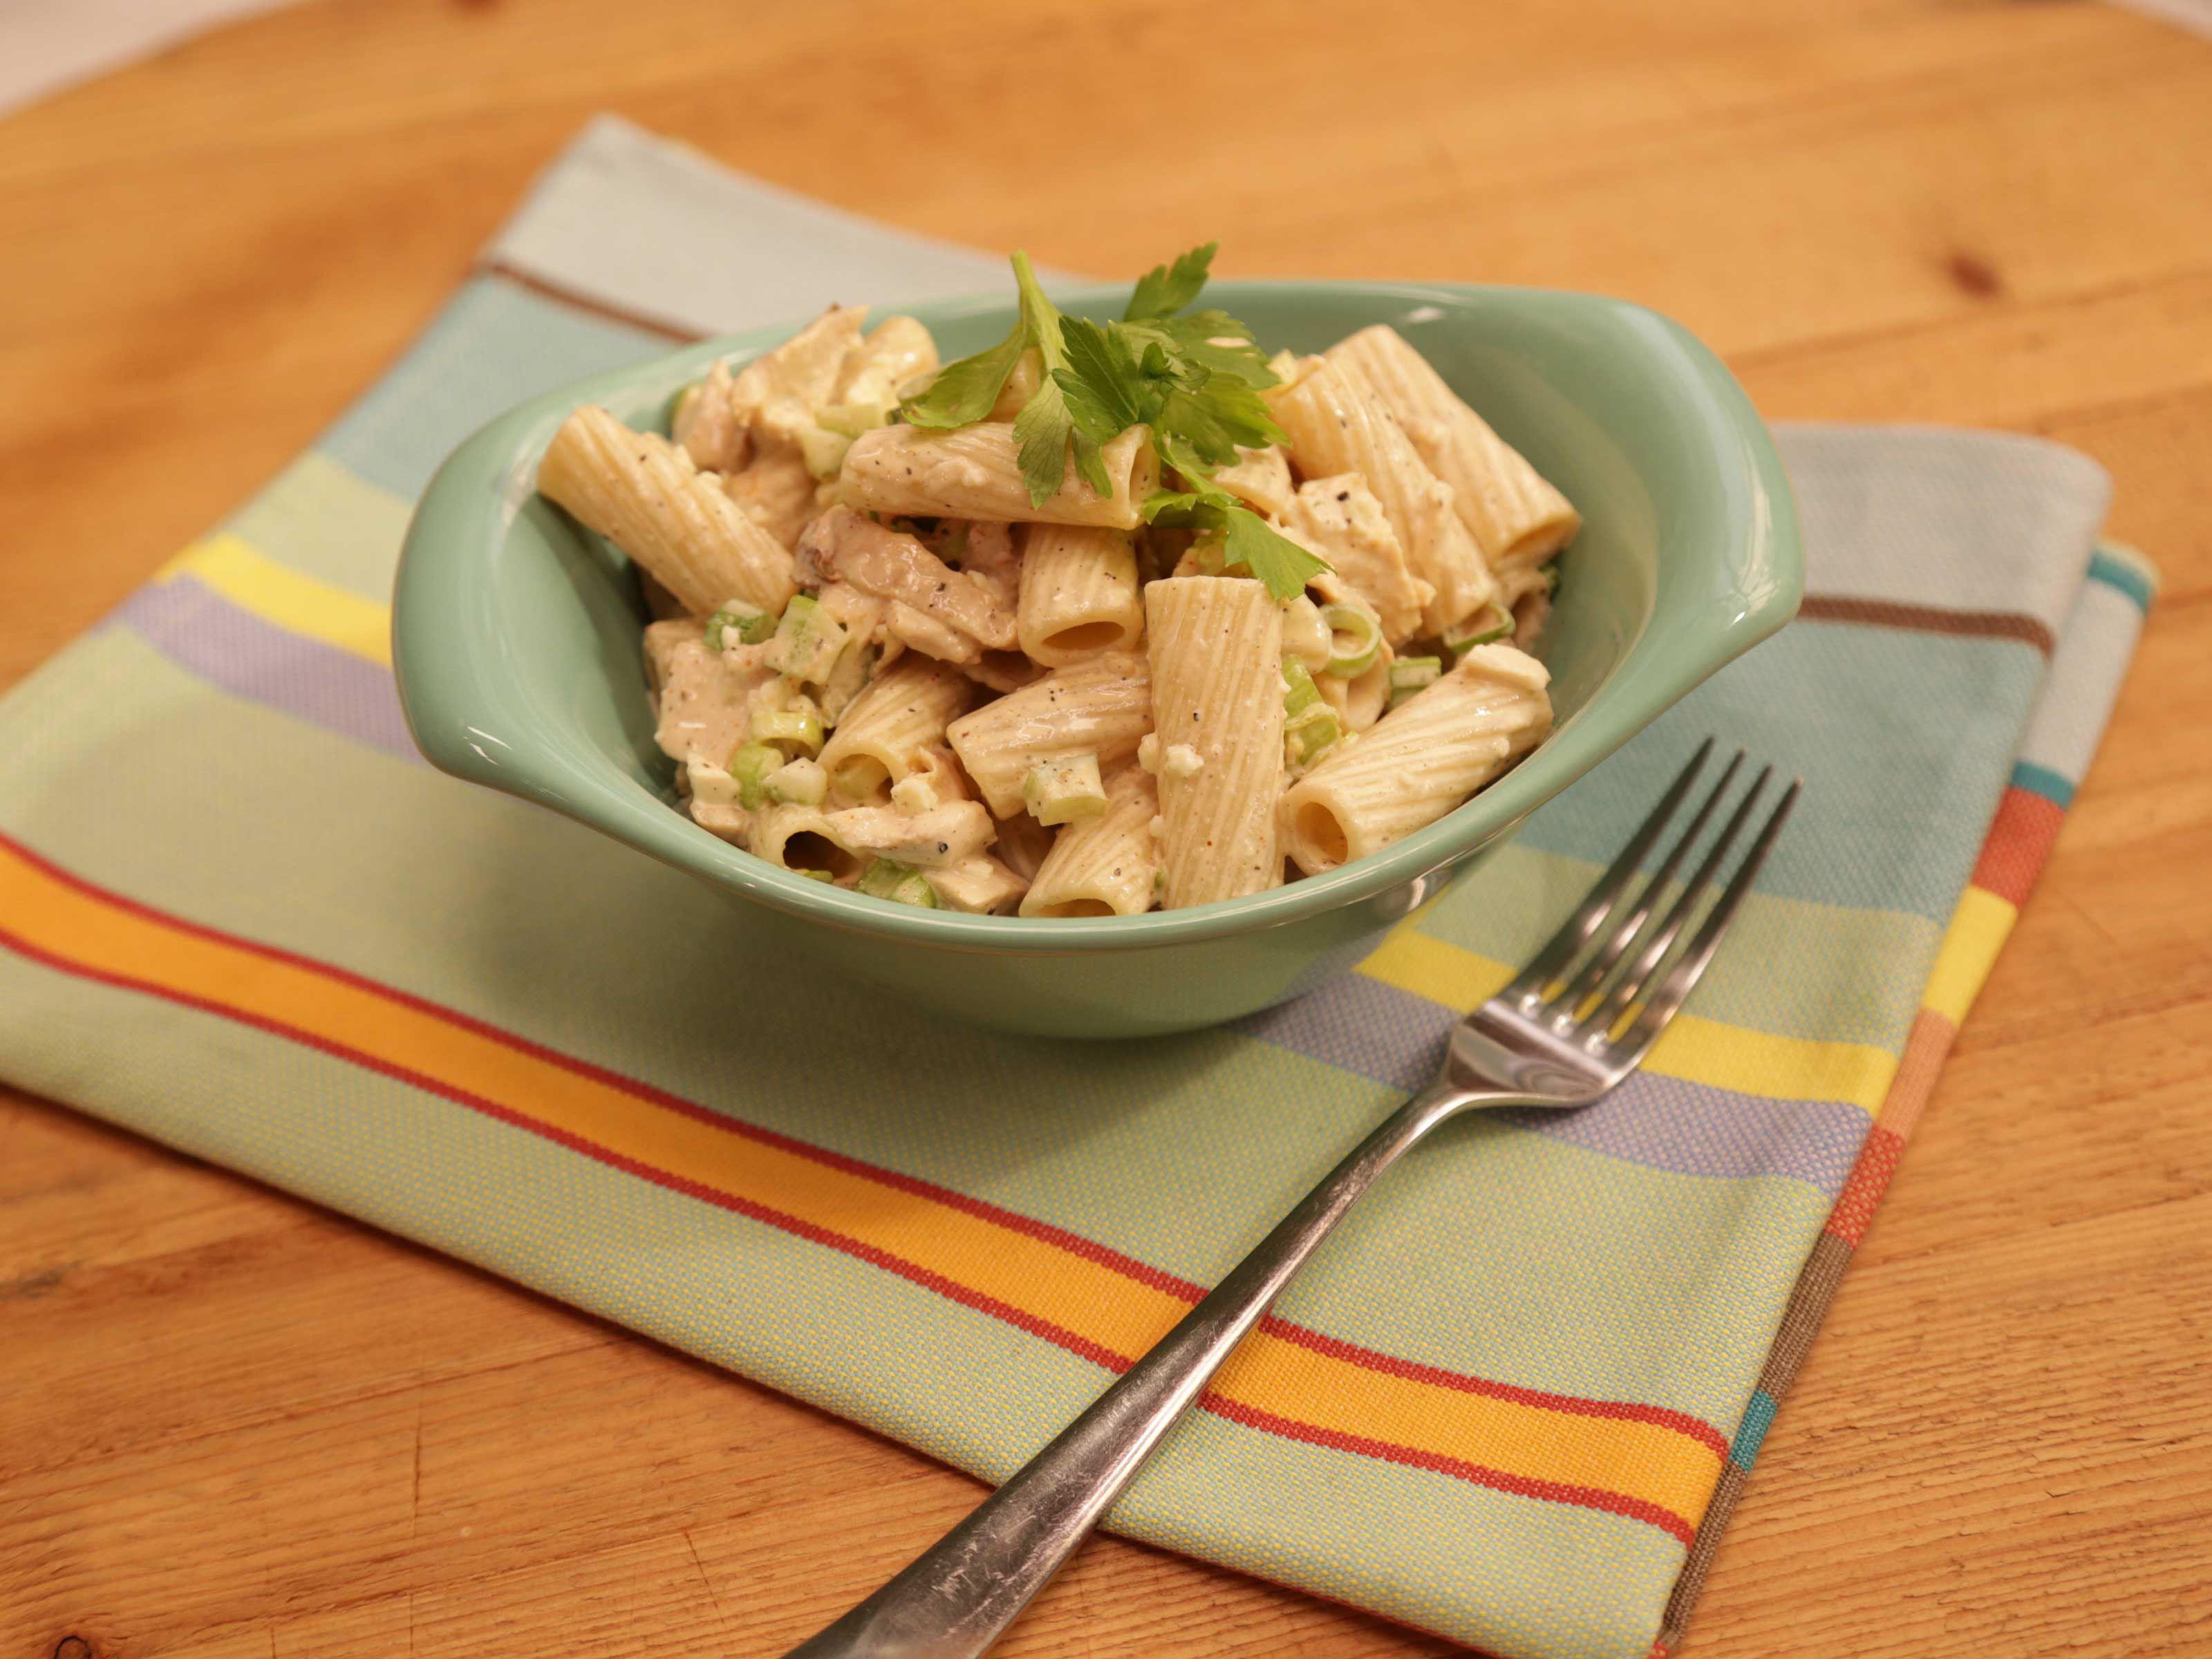 Buffalo chicken pasta salad recipe from the kitchen via food network buffalo chicken pasta salad recipe from the kitchen via food network forumfinder Choice Image